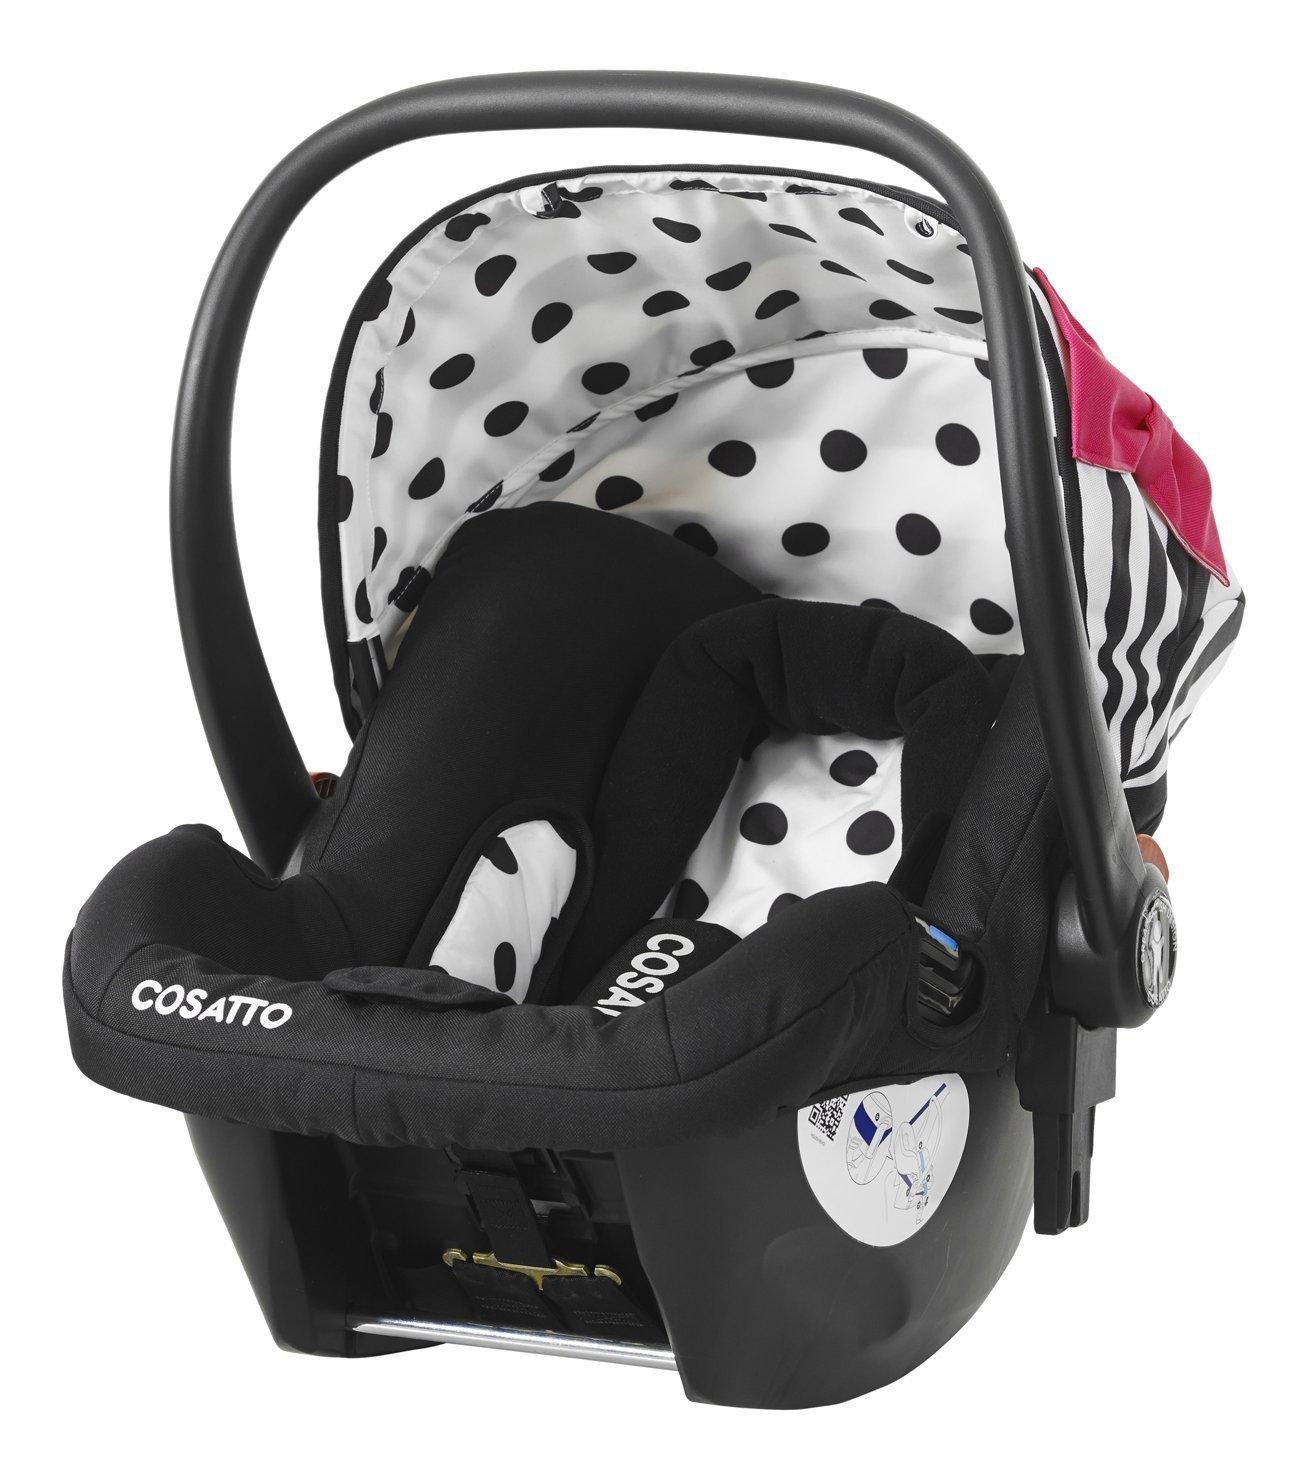 COSATTO Cosatto Κάθισμα Aυτοκινήτου Aσφαλείας Hold Go Lightly 0-13Kg 3168 βόλτα   ασφάλεια   καθίσματα αυτοκινήτου   βρεφικά καθίσματα ασφαλείας αυτοκινήτ